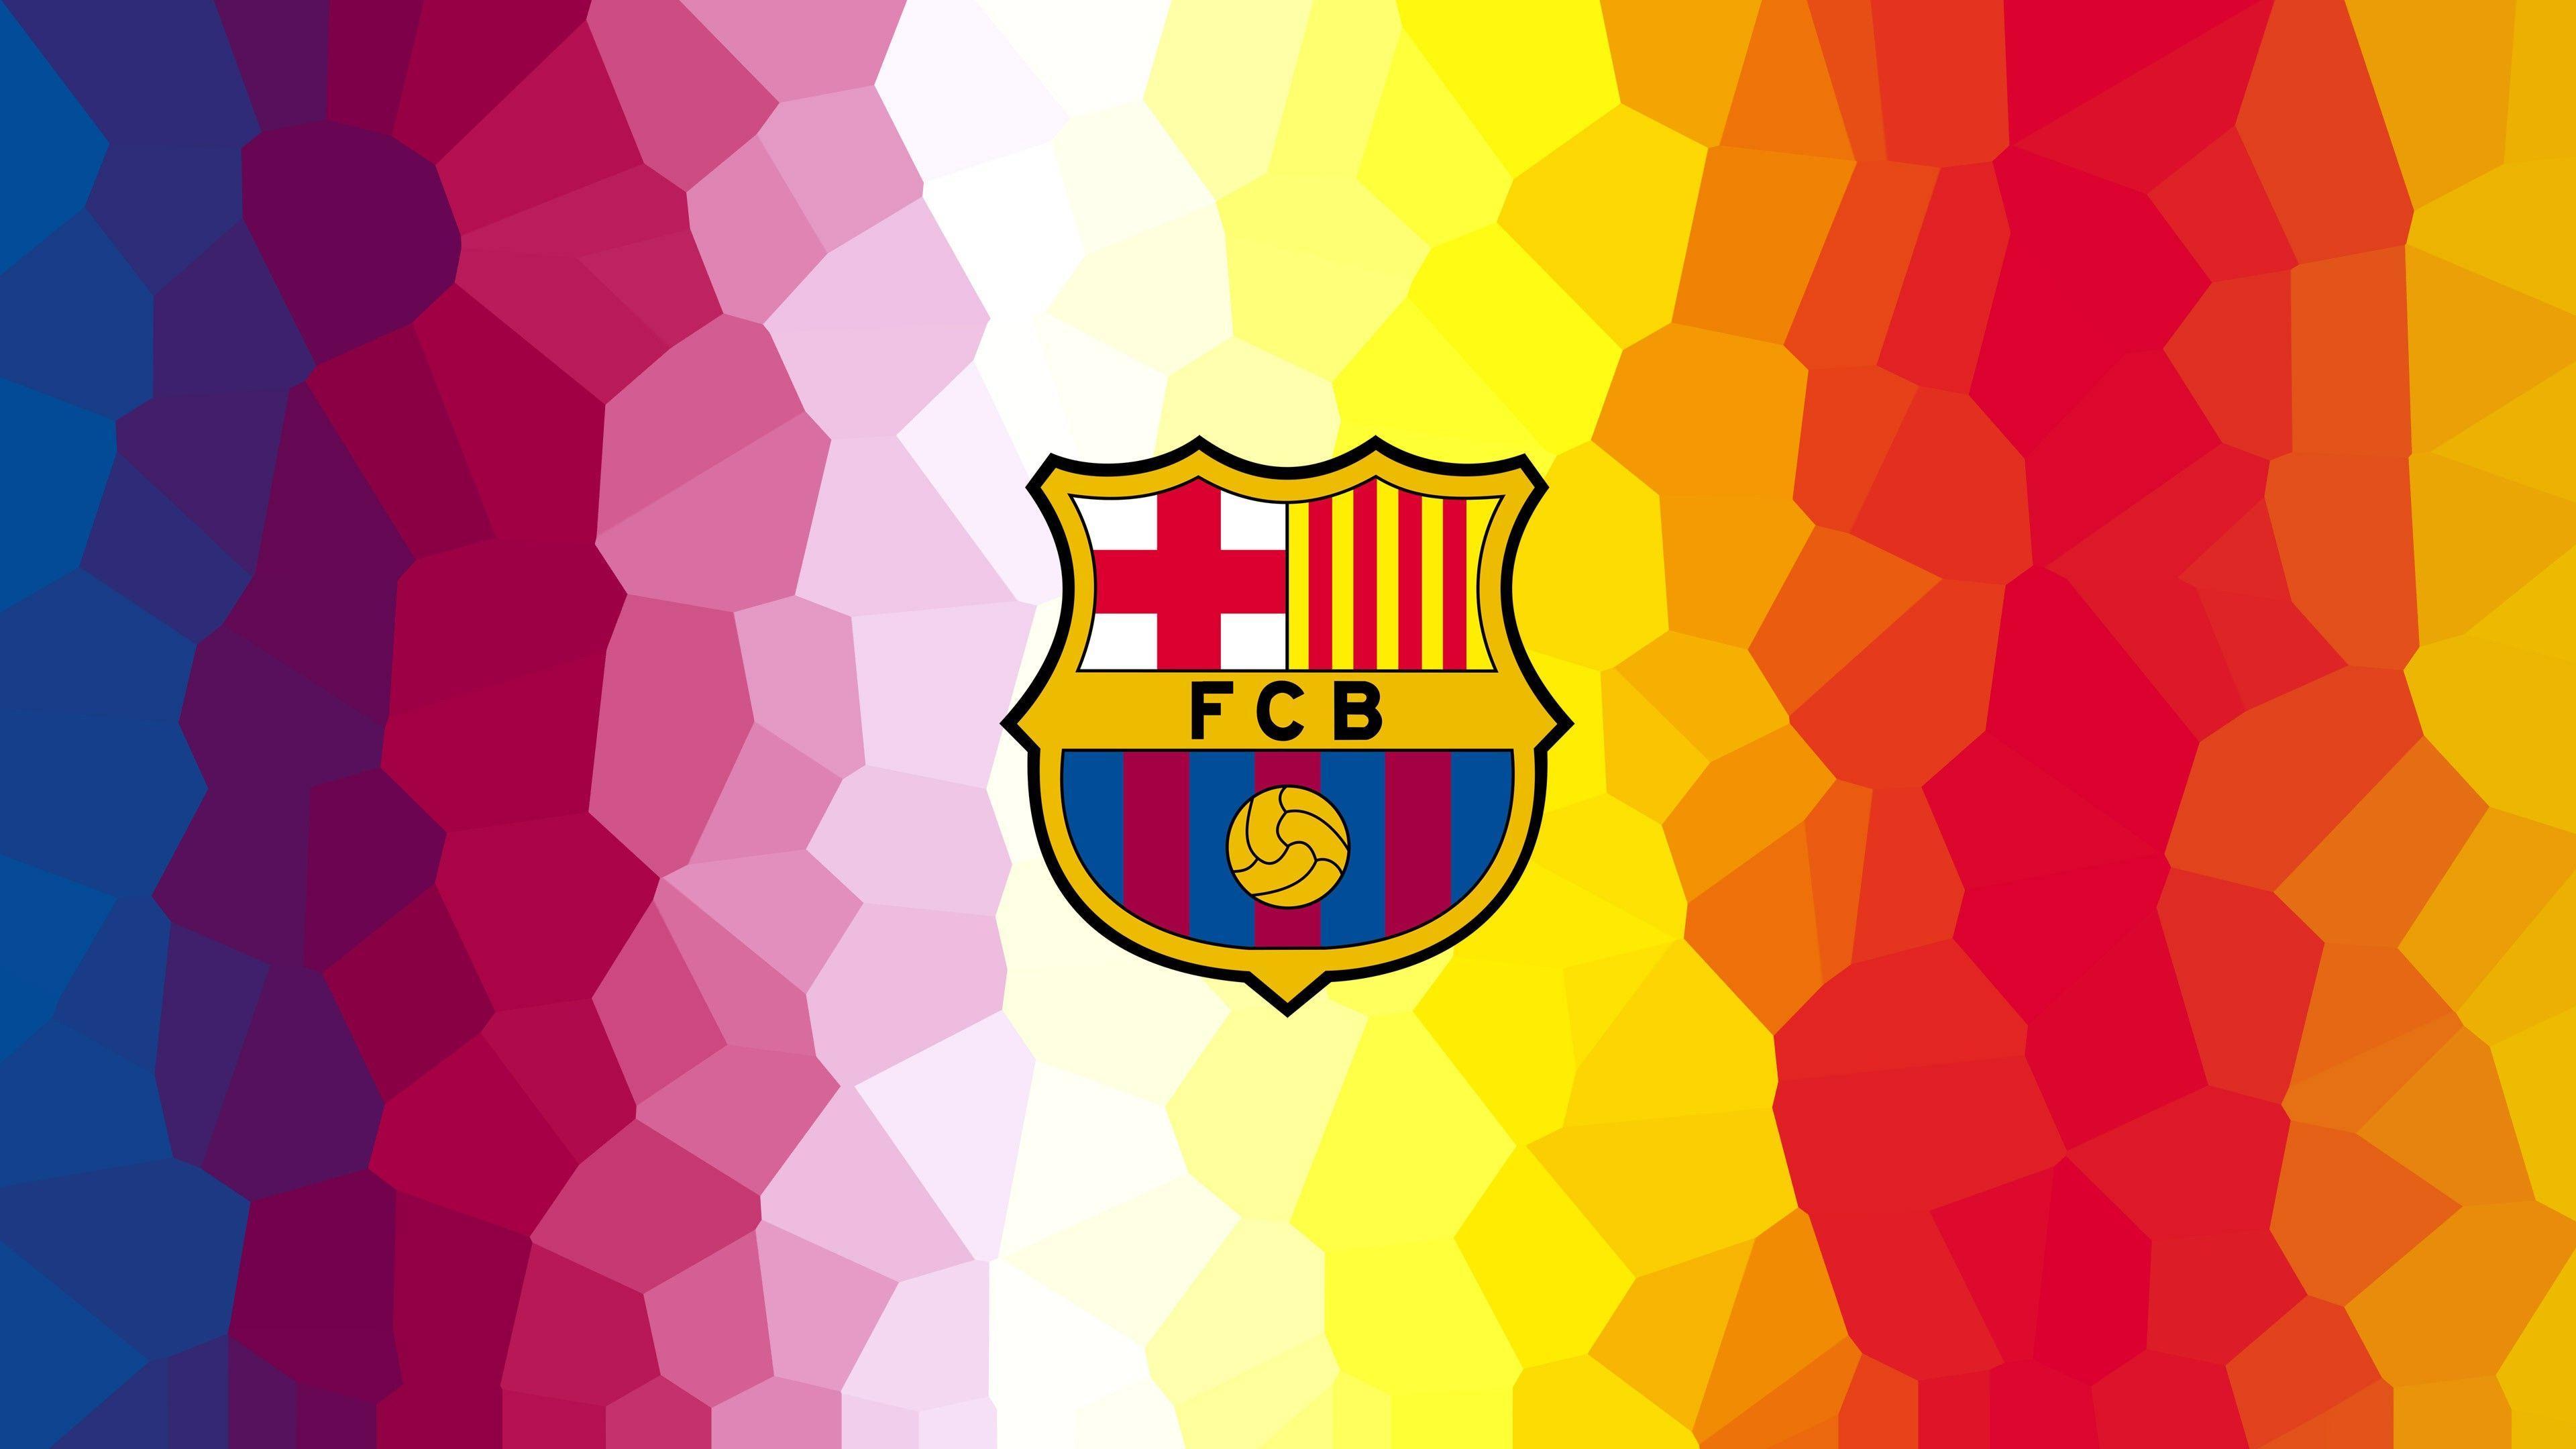 Fc Barcelona 2018 Wallpapers Wallpaper Cave